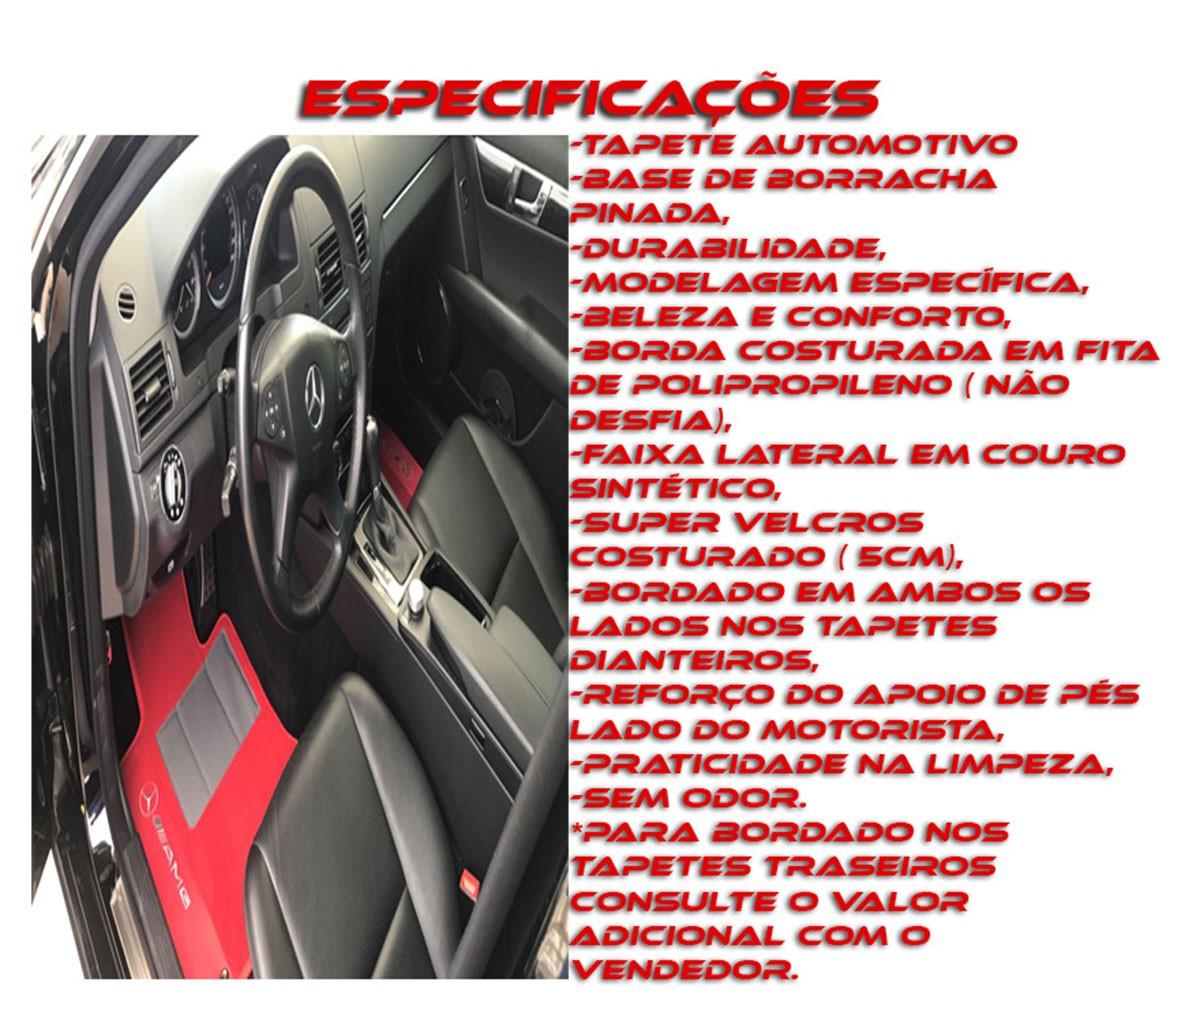 Jogo de Tapetes Peugeot 207 Luxo Base Pinada